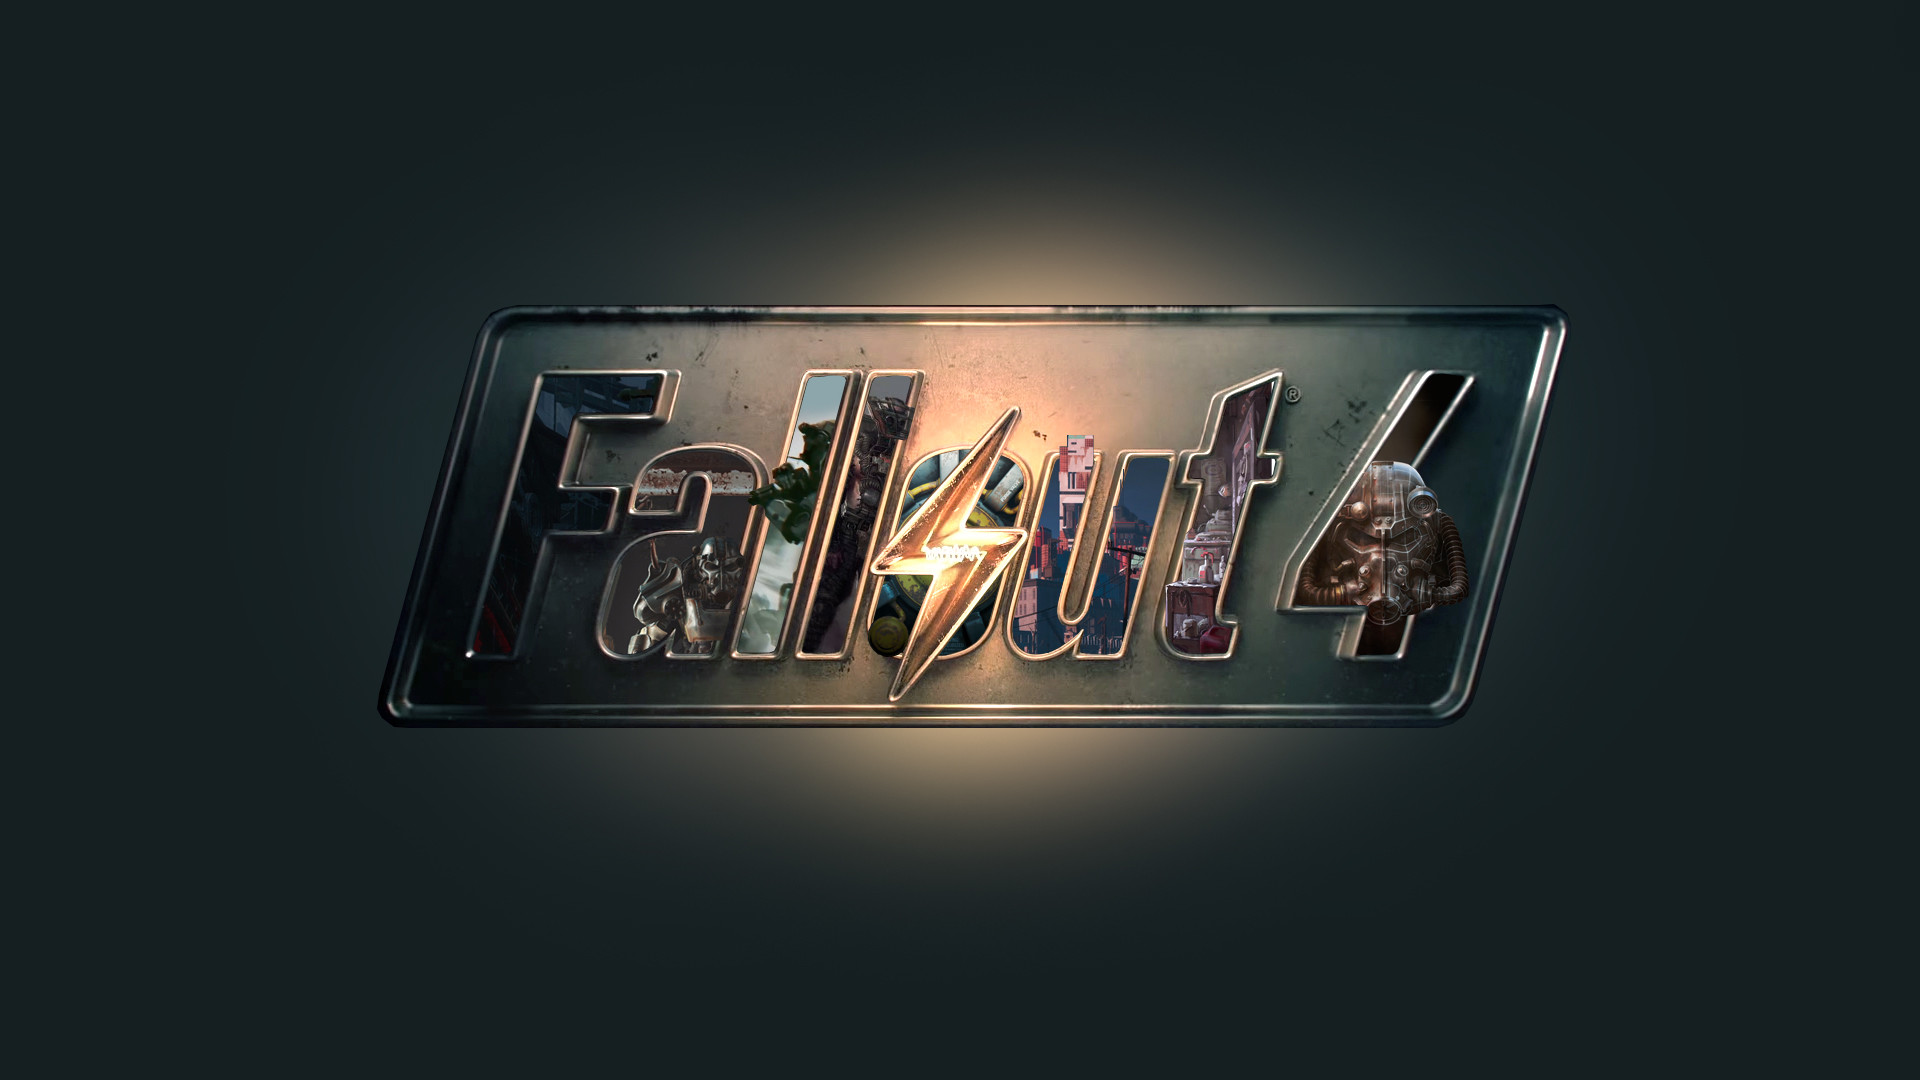 Desktop fallout logo wallpaper backgrounds.